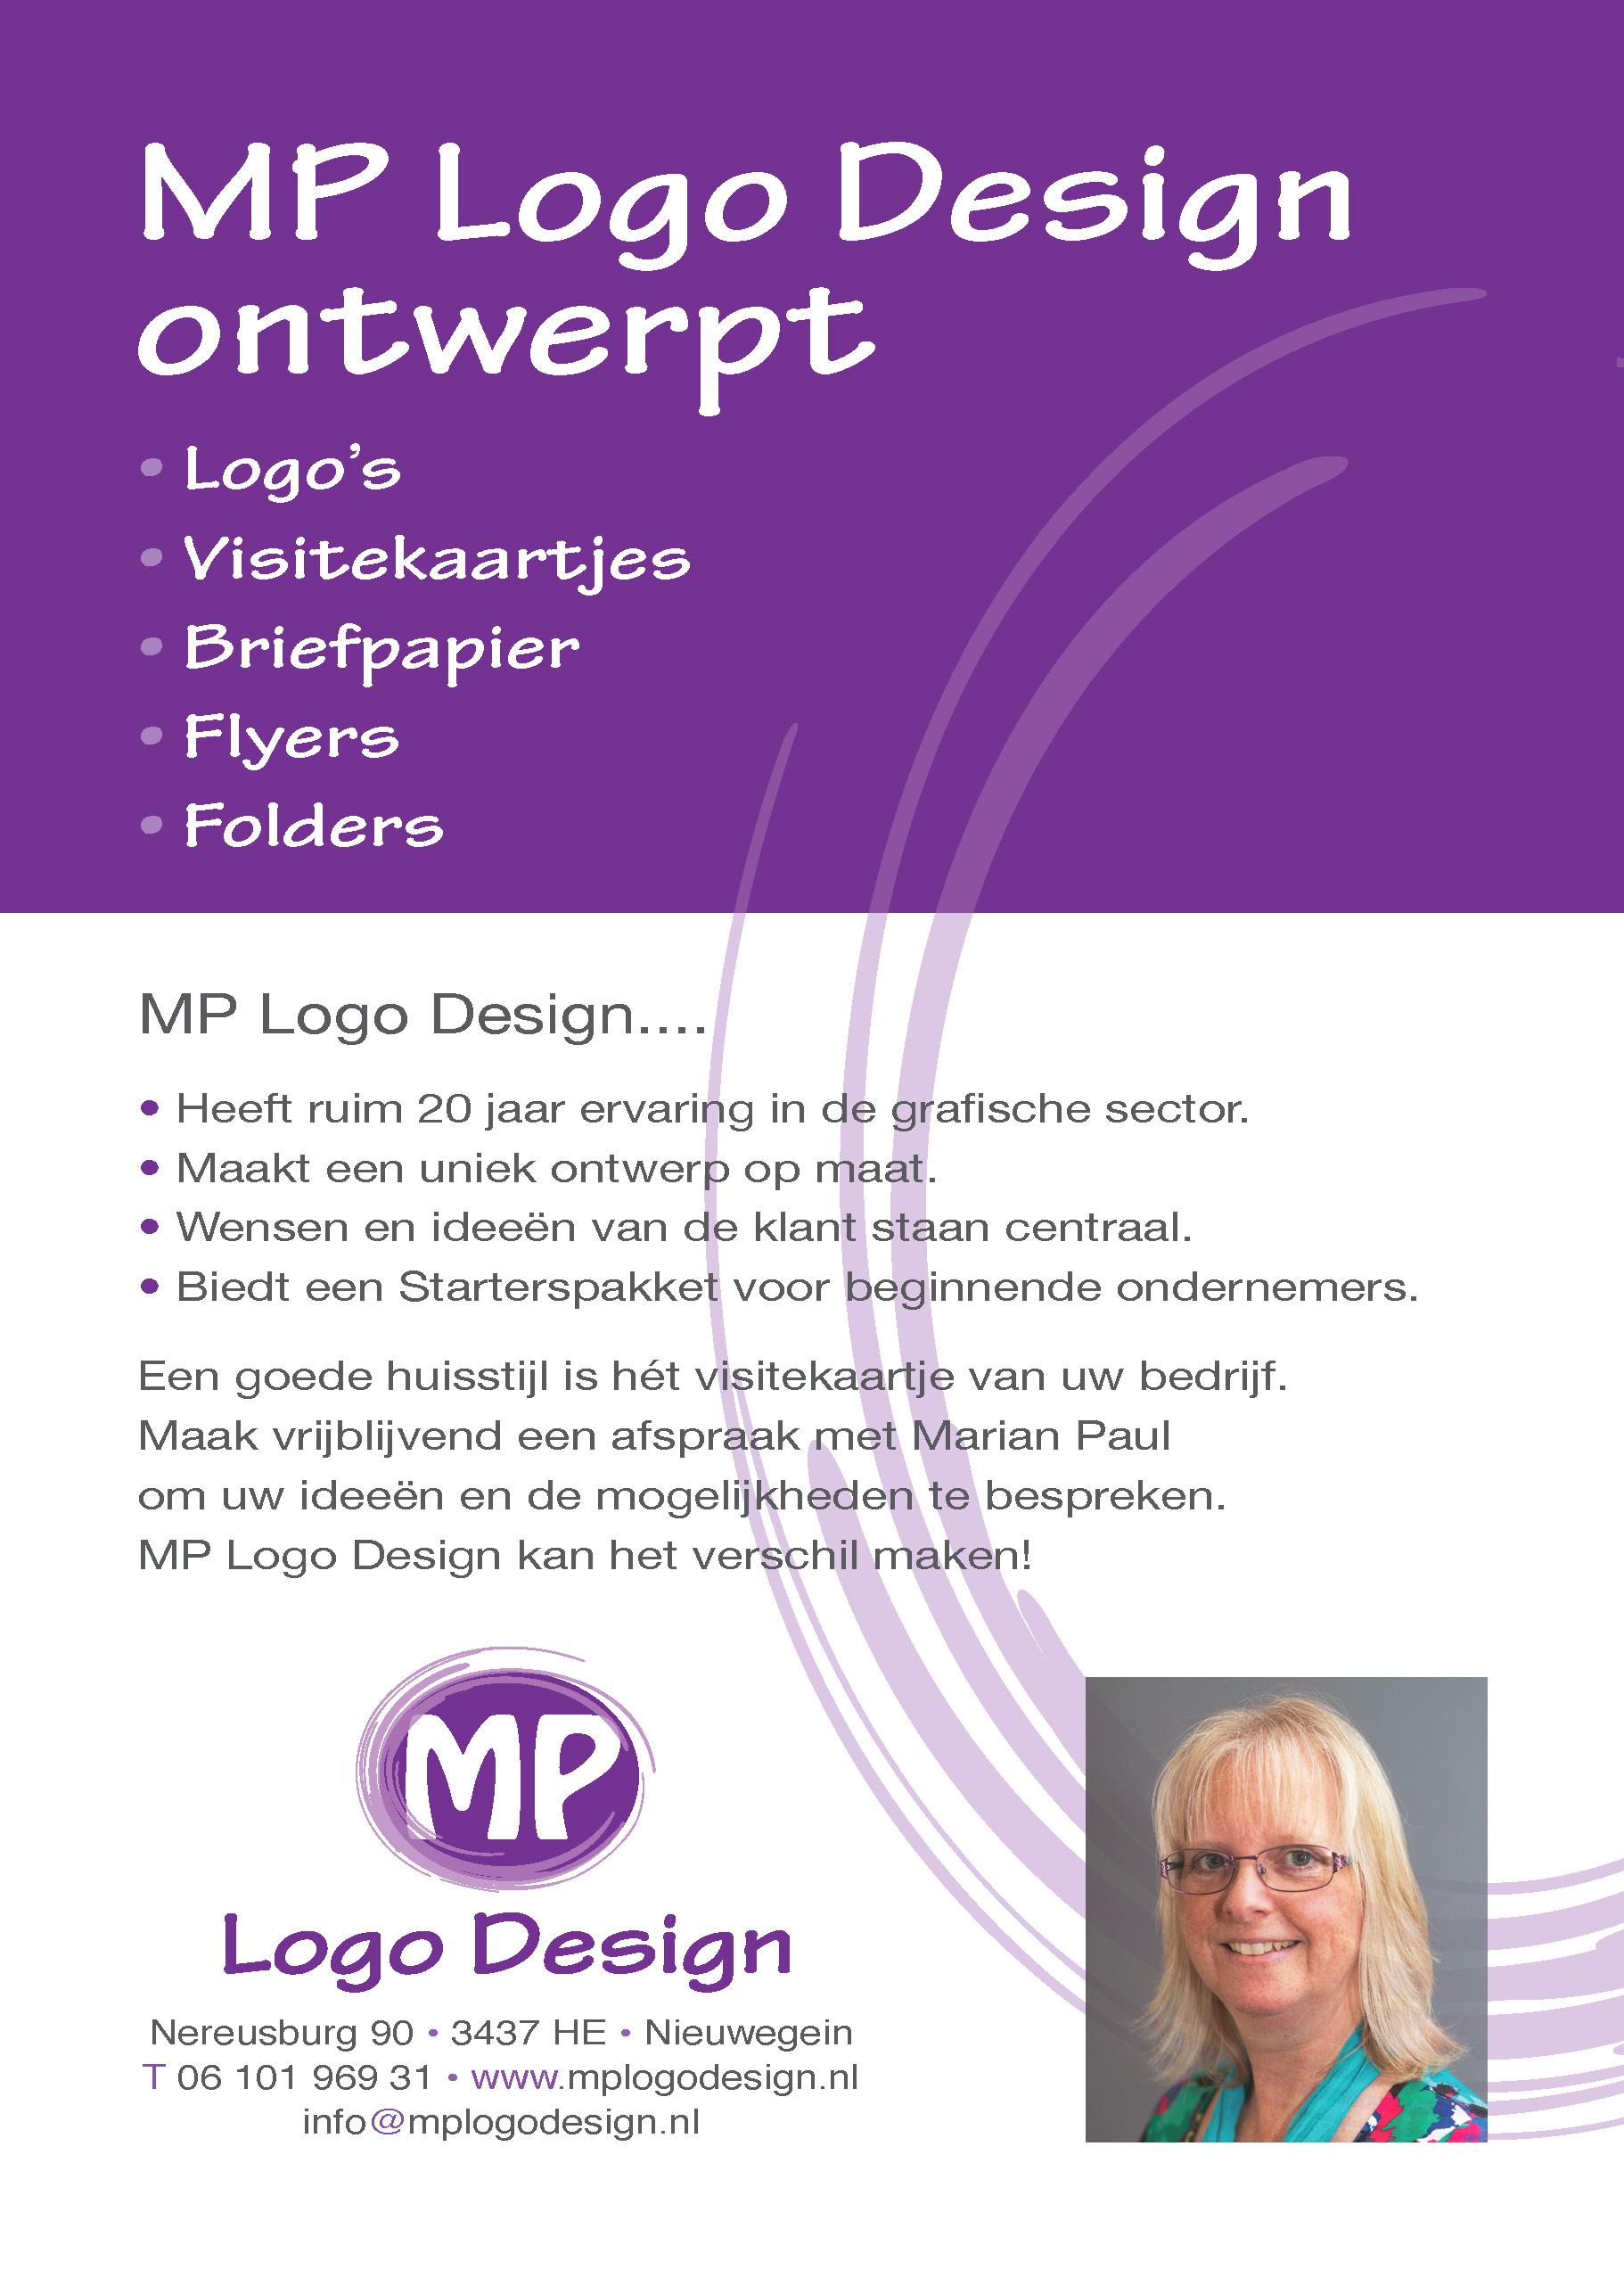 FlyerA5_MPlogoDesign